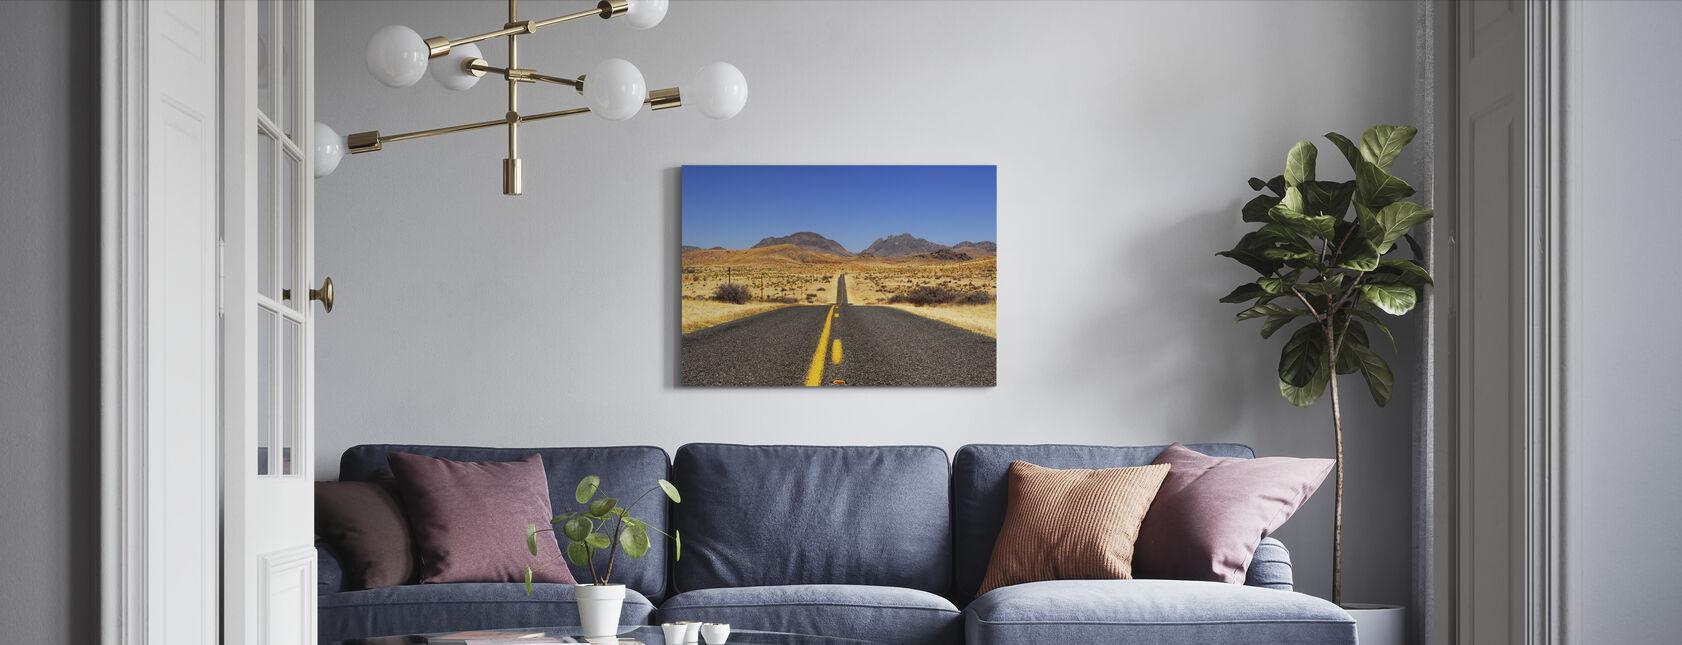 Mistet Highway - Lerretsbilde - Stue